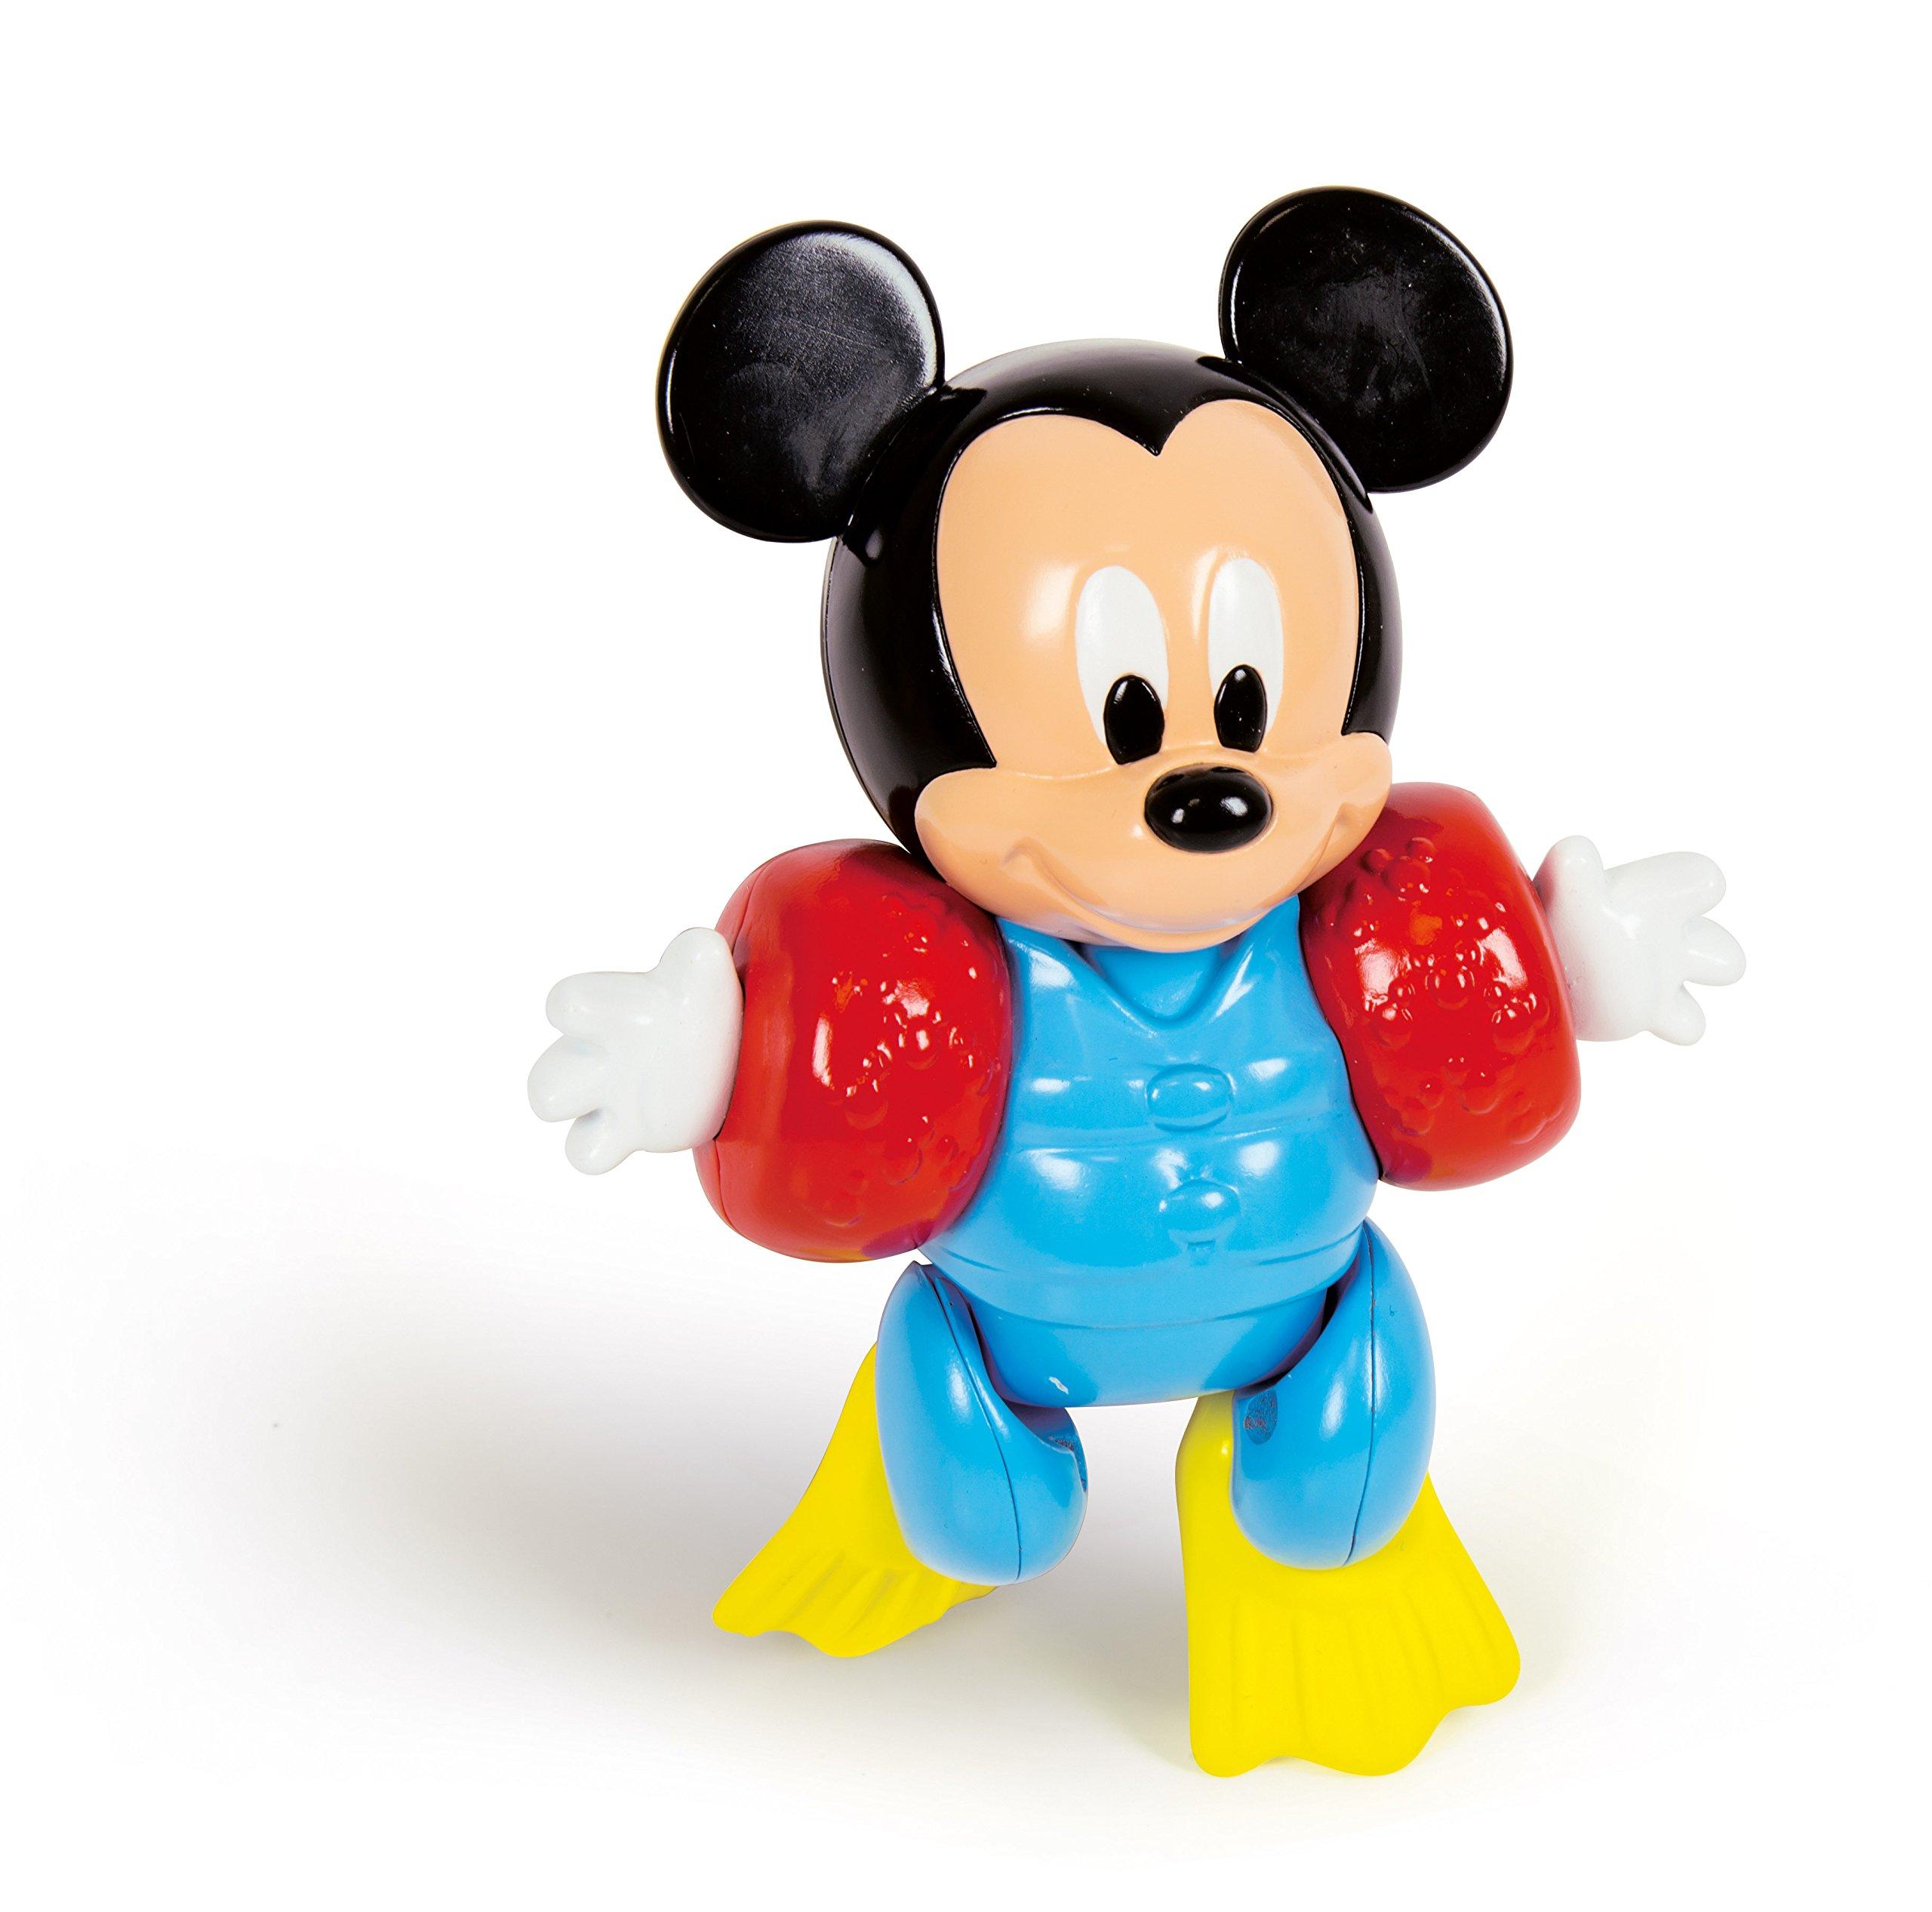 Clementoni 17094 Baby Mickey Bath Toy Fish Toy Kids Children Fun ...